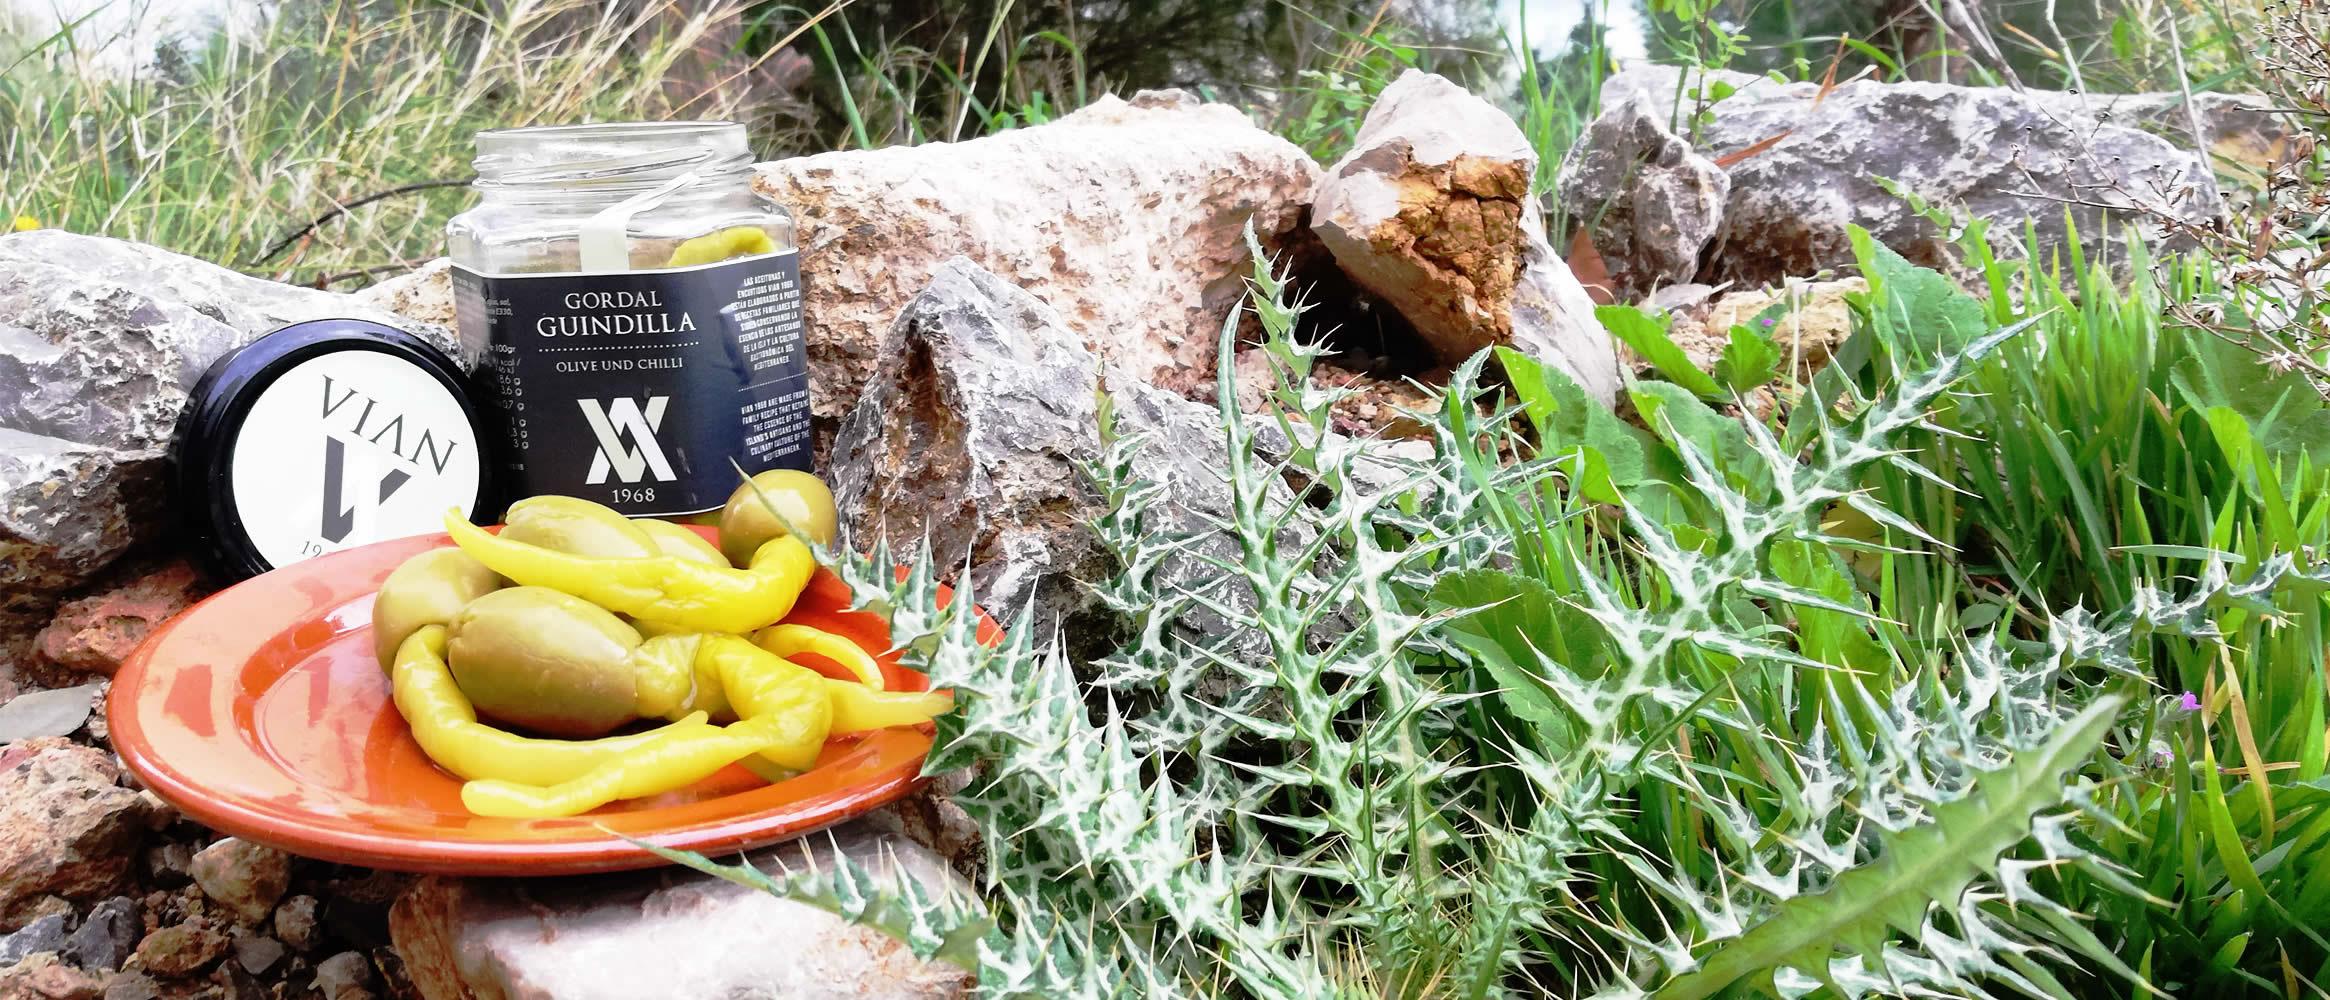 Vian Olivas con Guidillas Oliven mit Peperoni